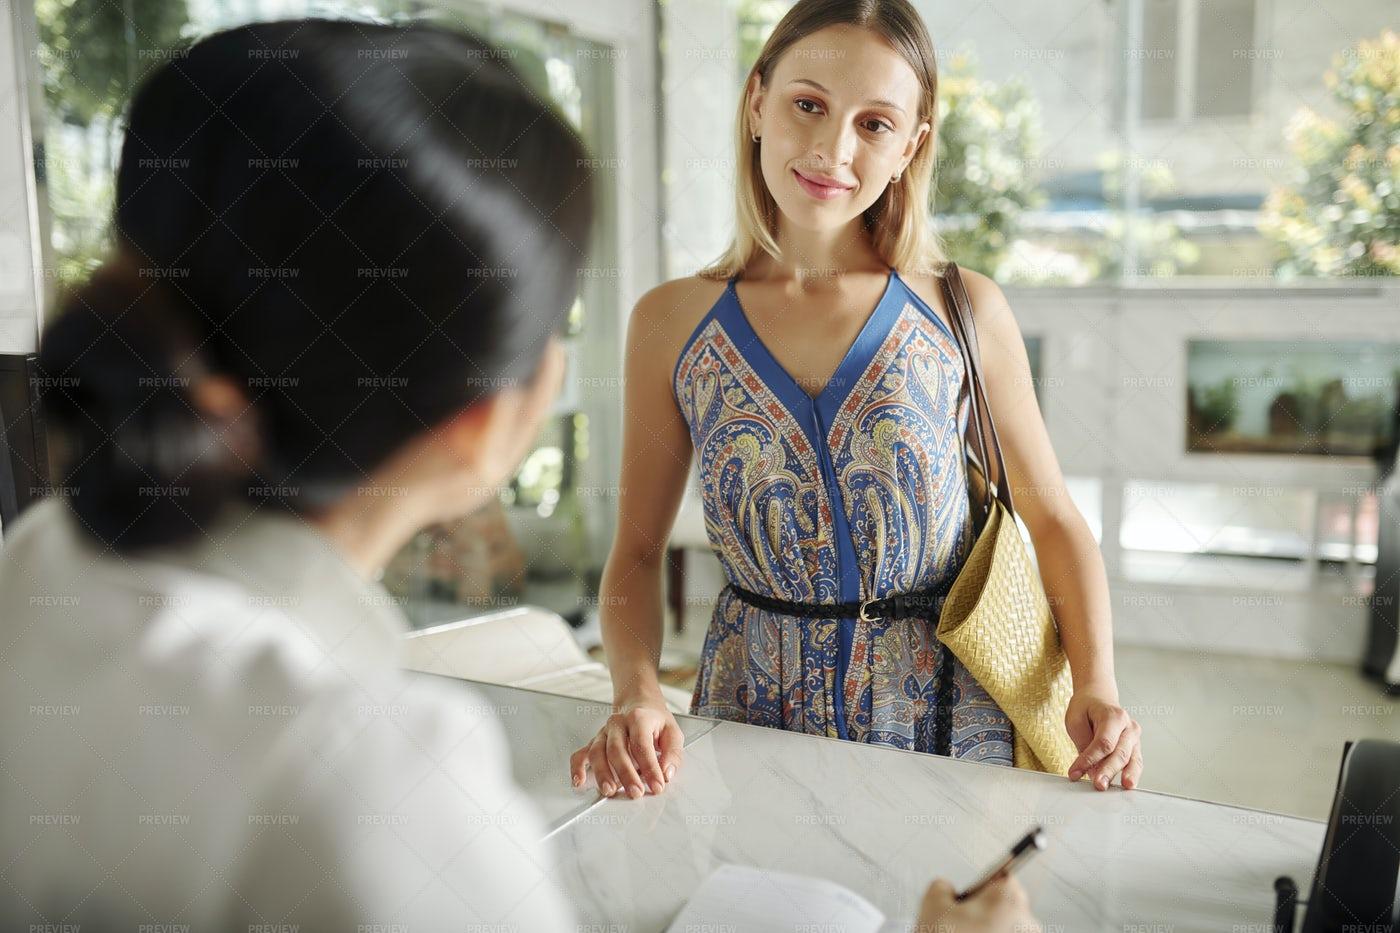 Woman At Spa Salon Reception: Stock Photos